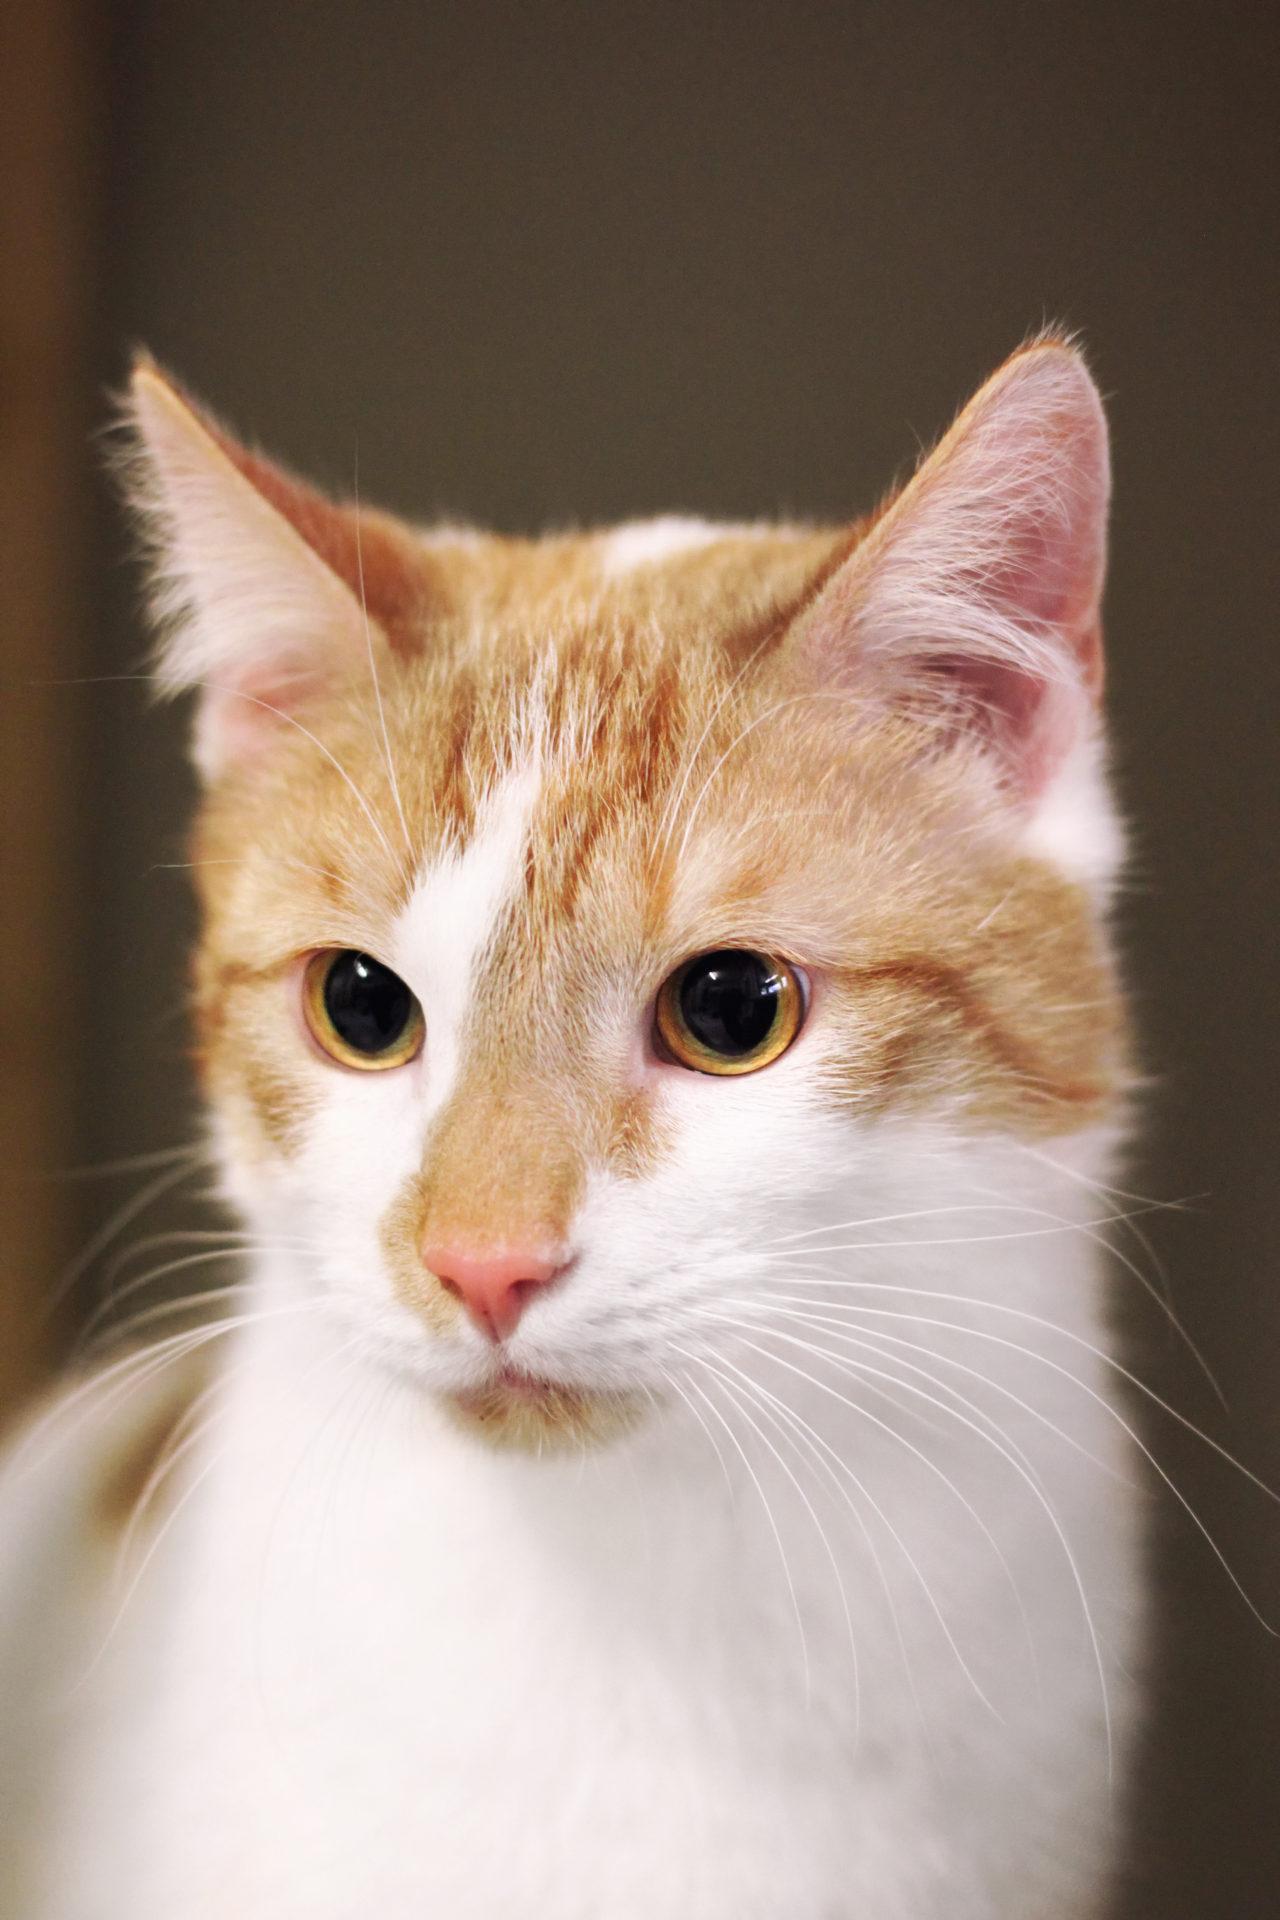 Cat White Orange - free images download | titania foto